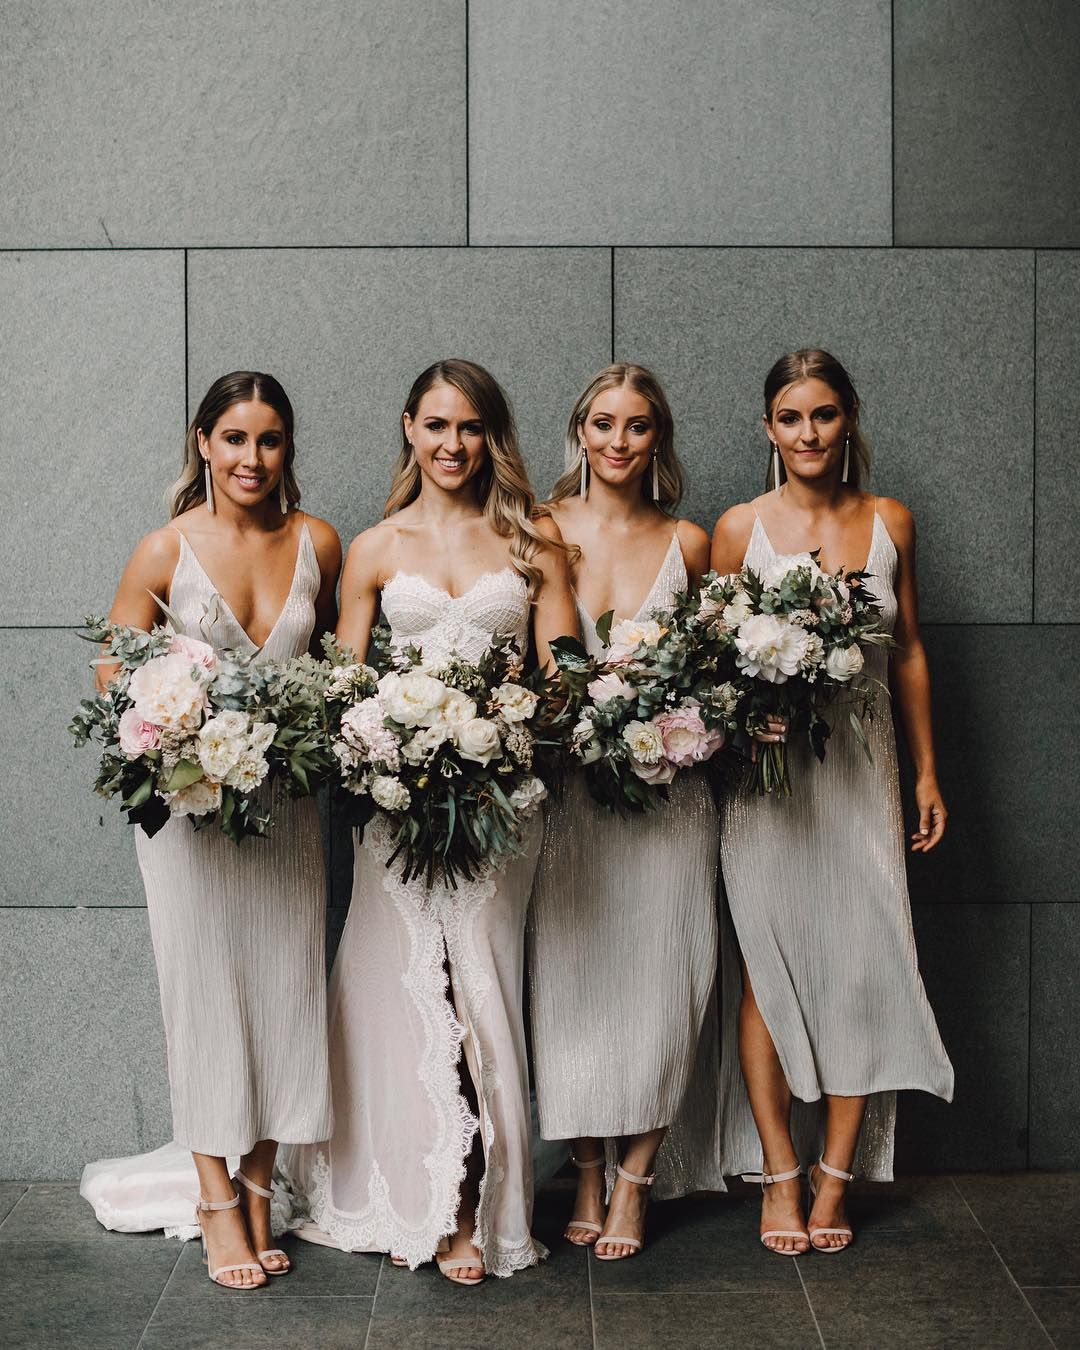 Wedding Venues Near Me Cheap: Botanical Bridal Bouquet, Grey Natalie Rolt Bridesmaid